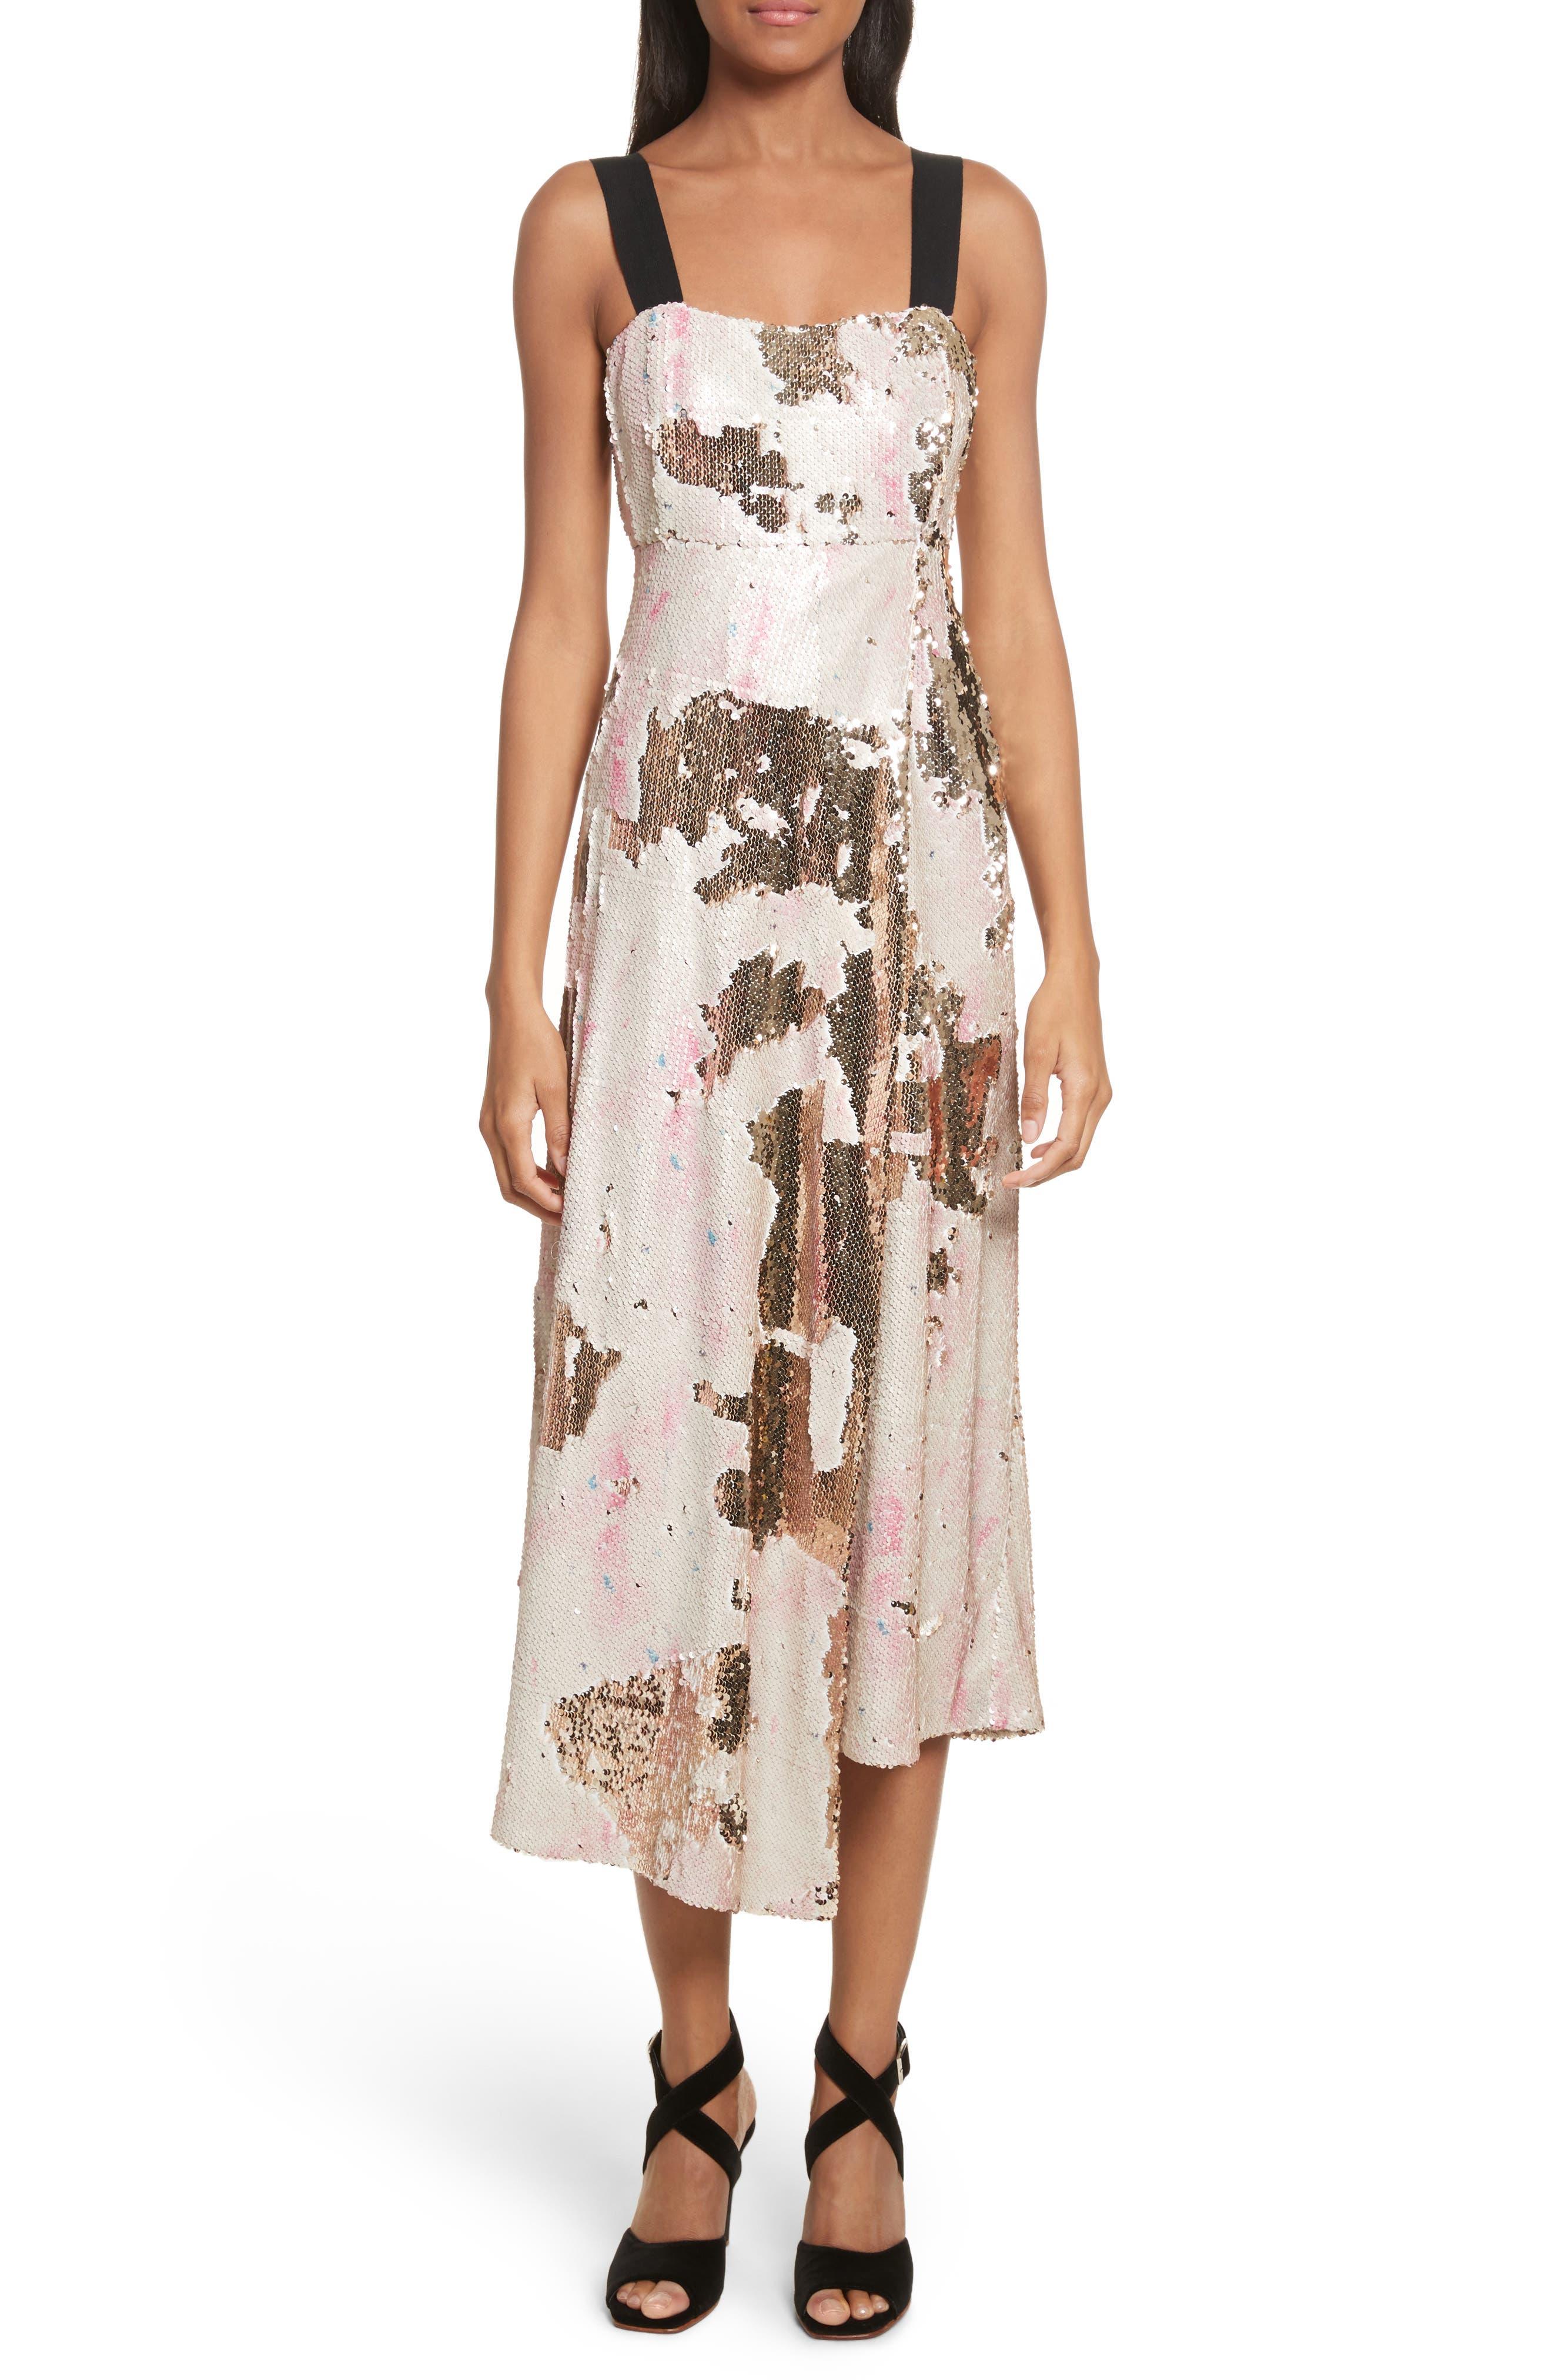 Alternate Image 1 Selected - Rachel Comey Slacken Sequined Dress